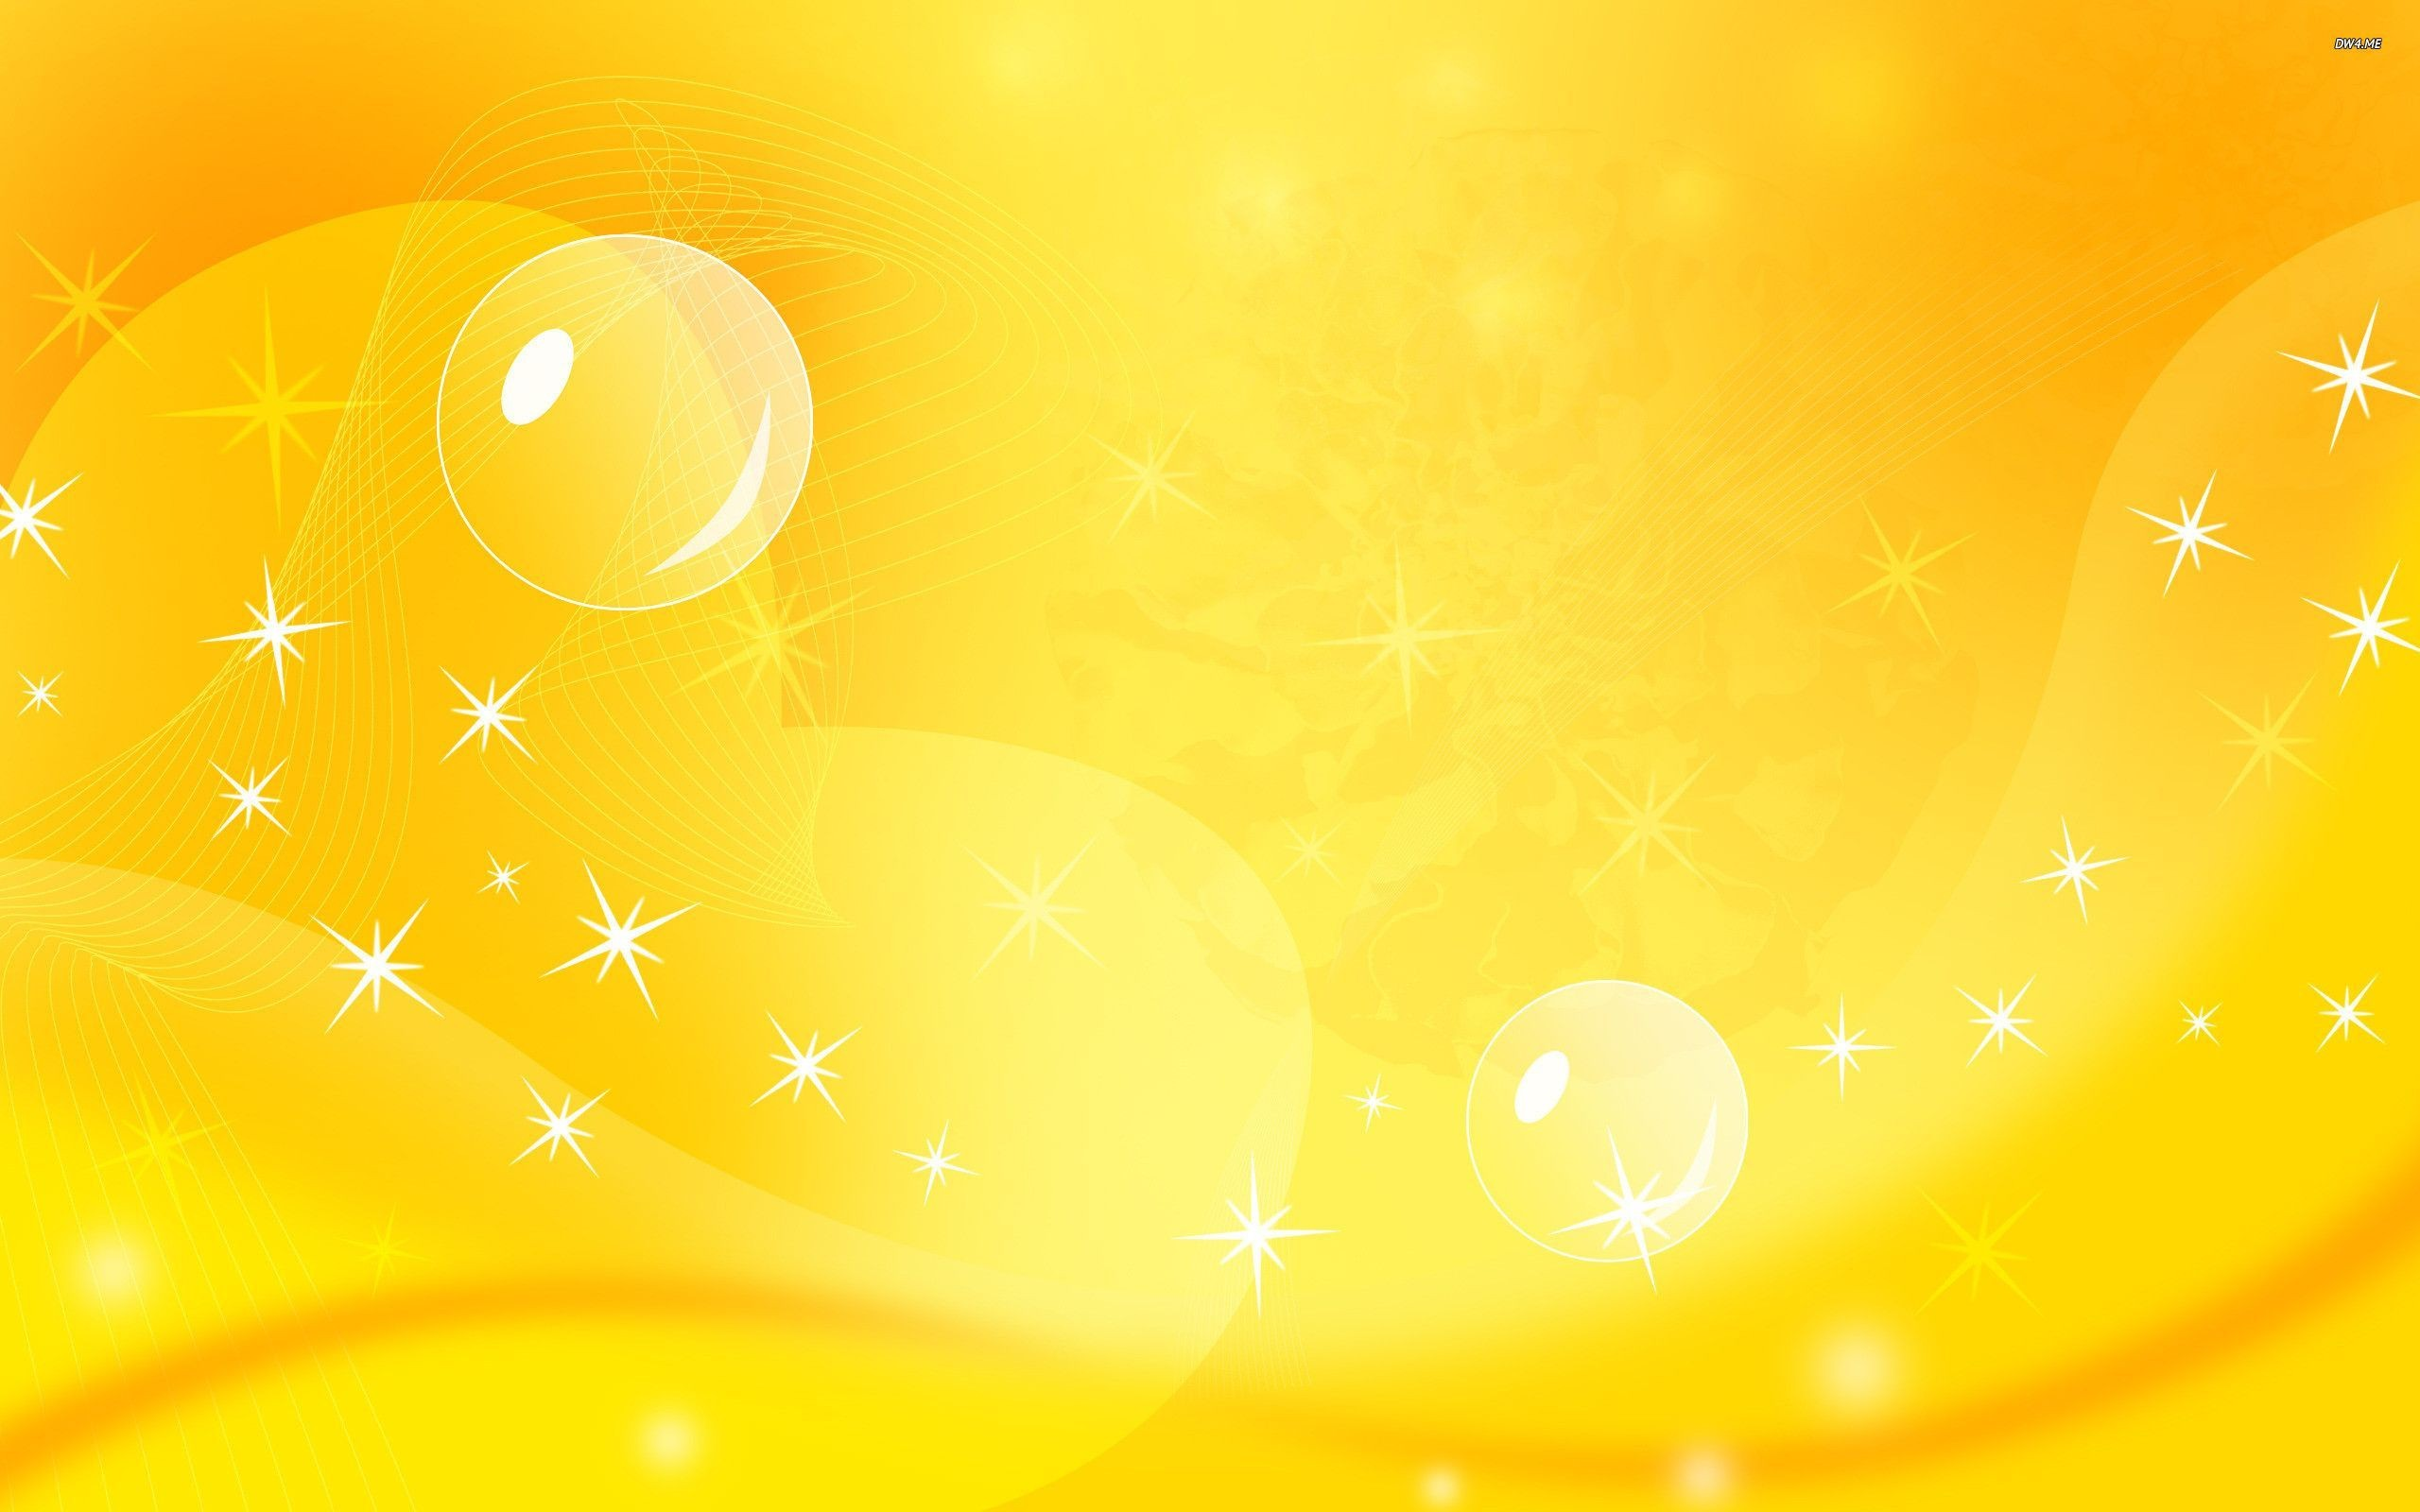 Yellow Wallpaper Download Free Beautiful Full Hd